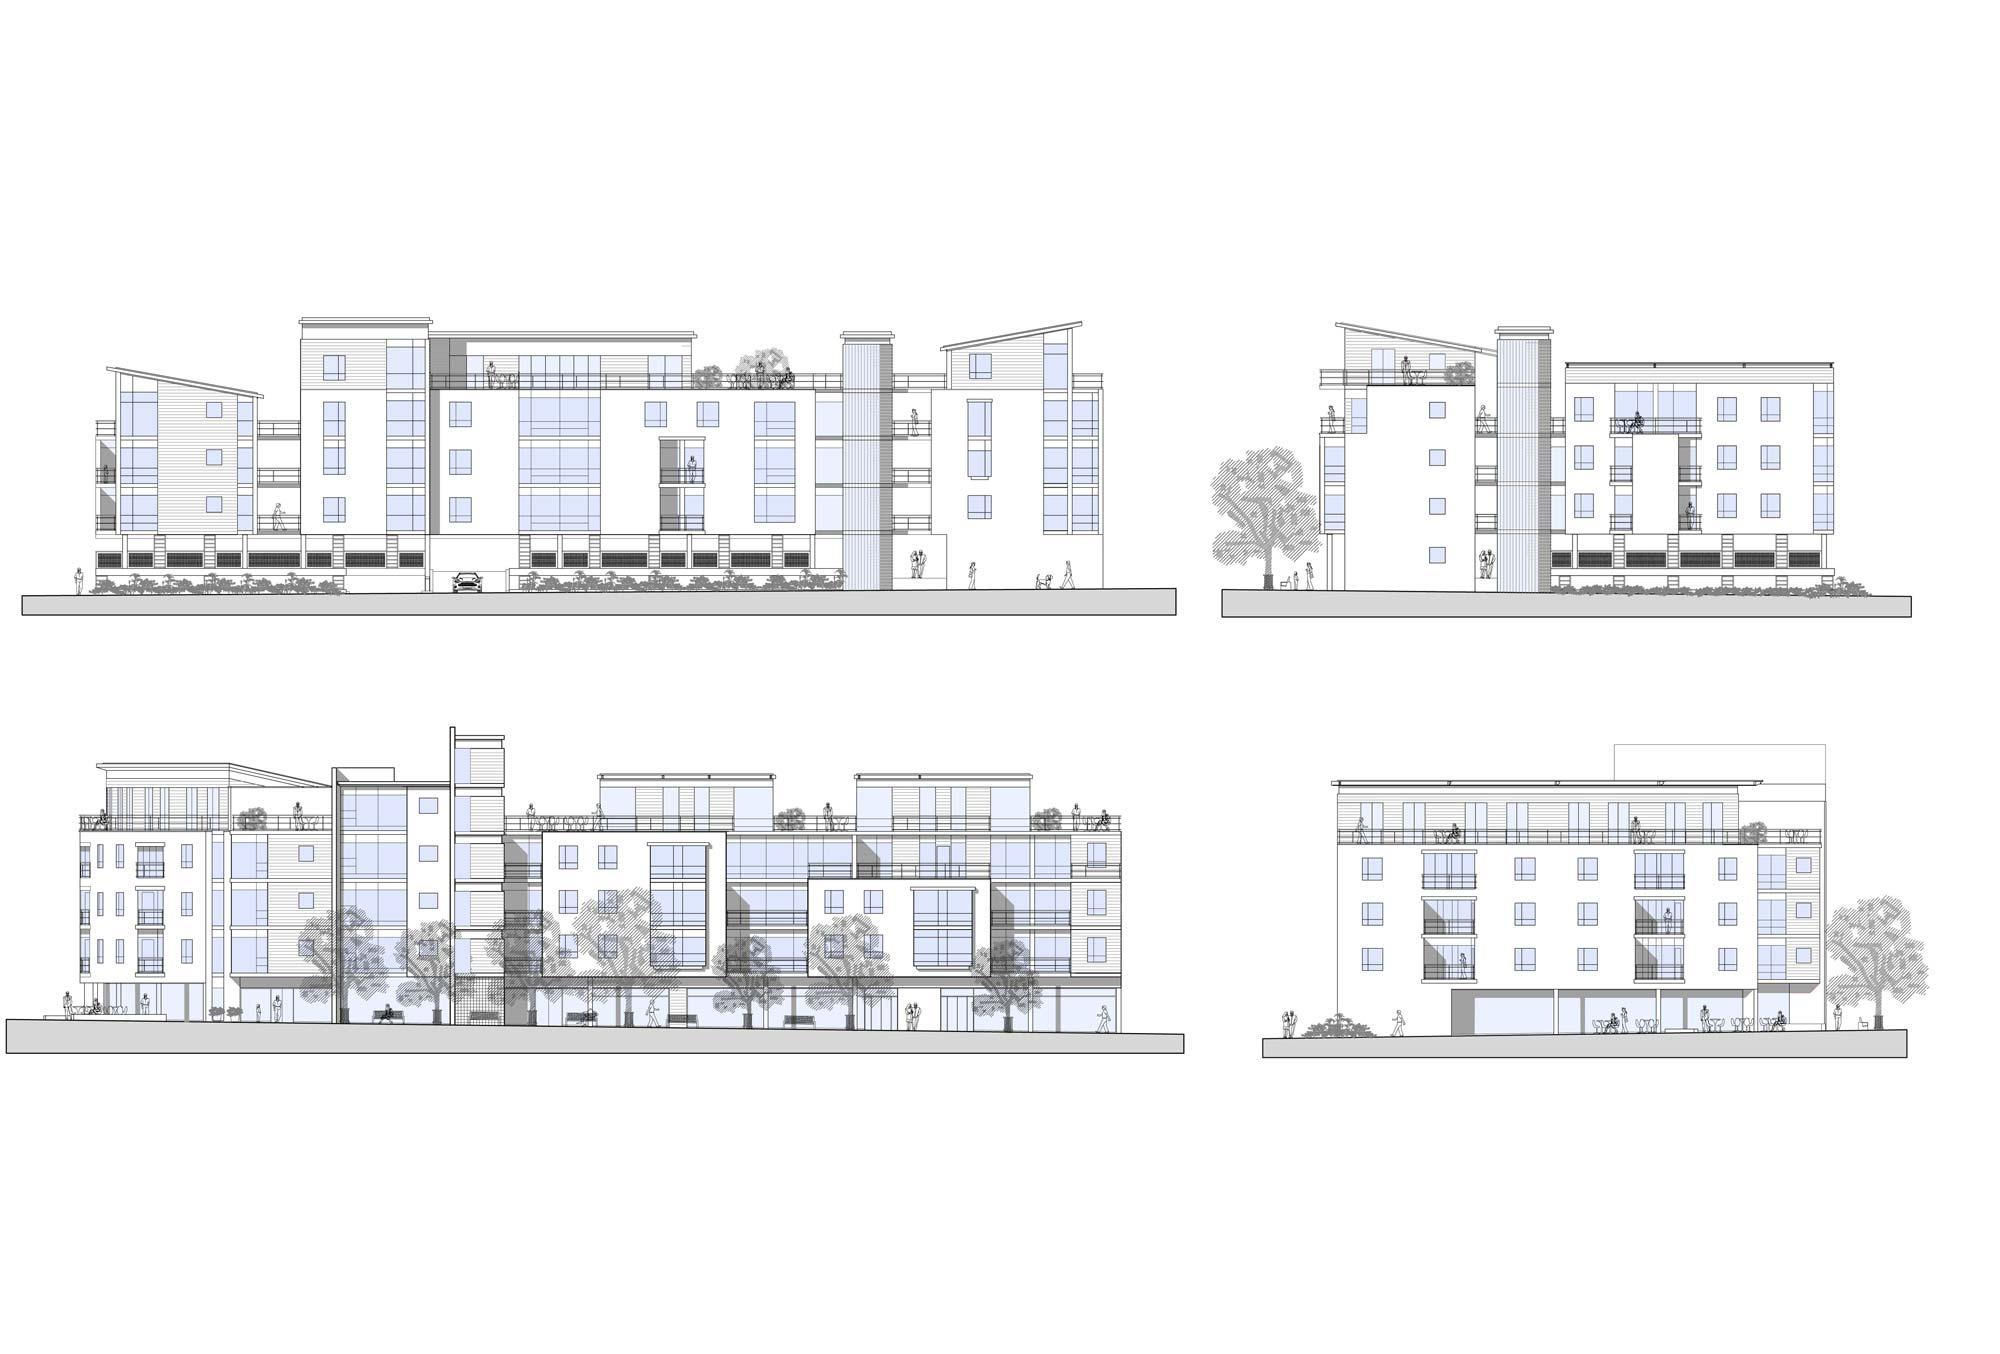 Newcastle under lyme brunswick street major commercial residential development elevations